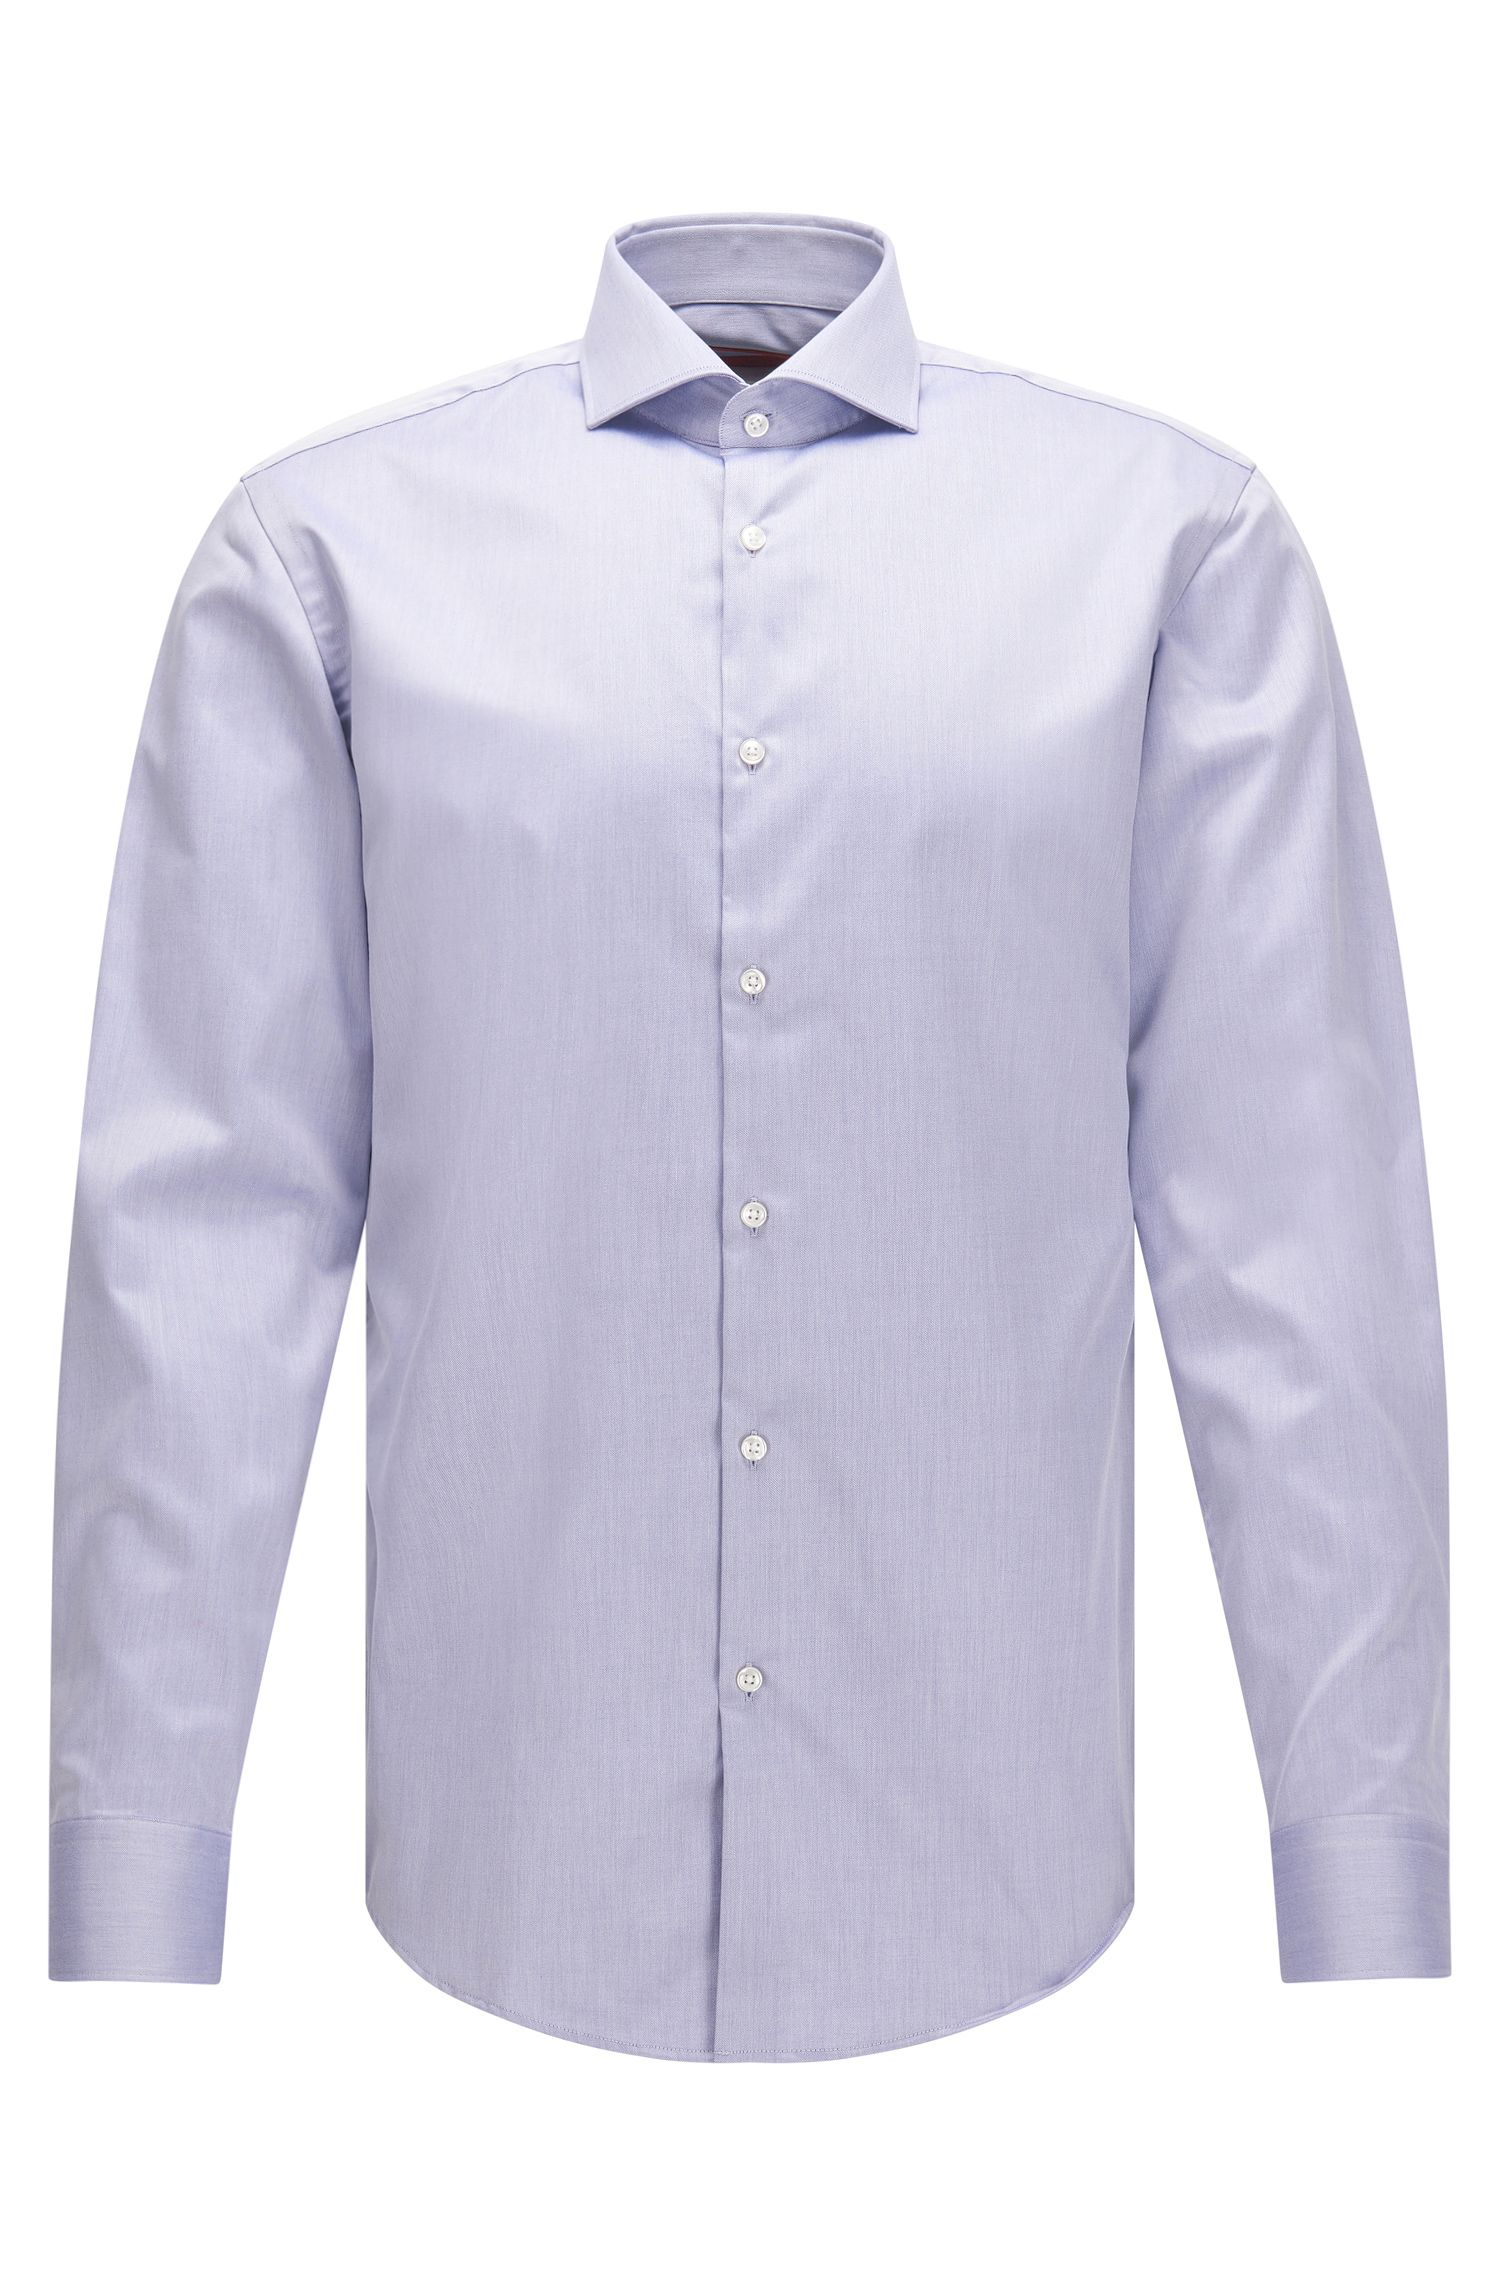 Easy Iron Cotton Poplin Shirt, Slim Fit   C-Jason